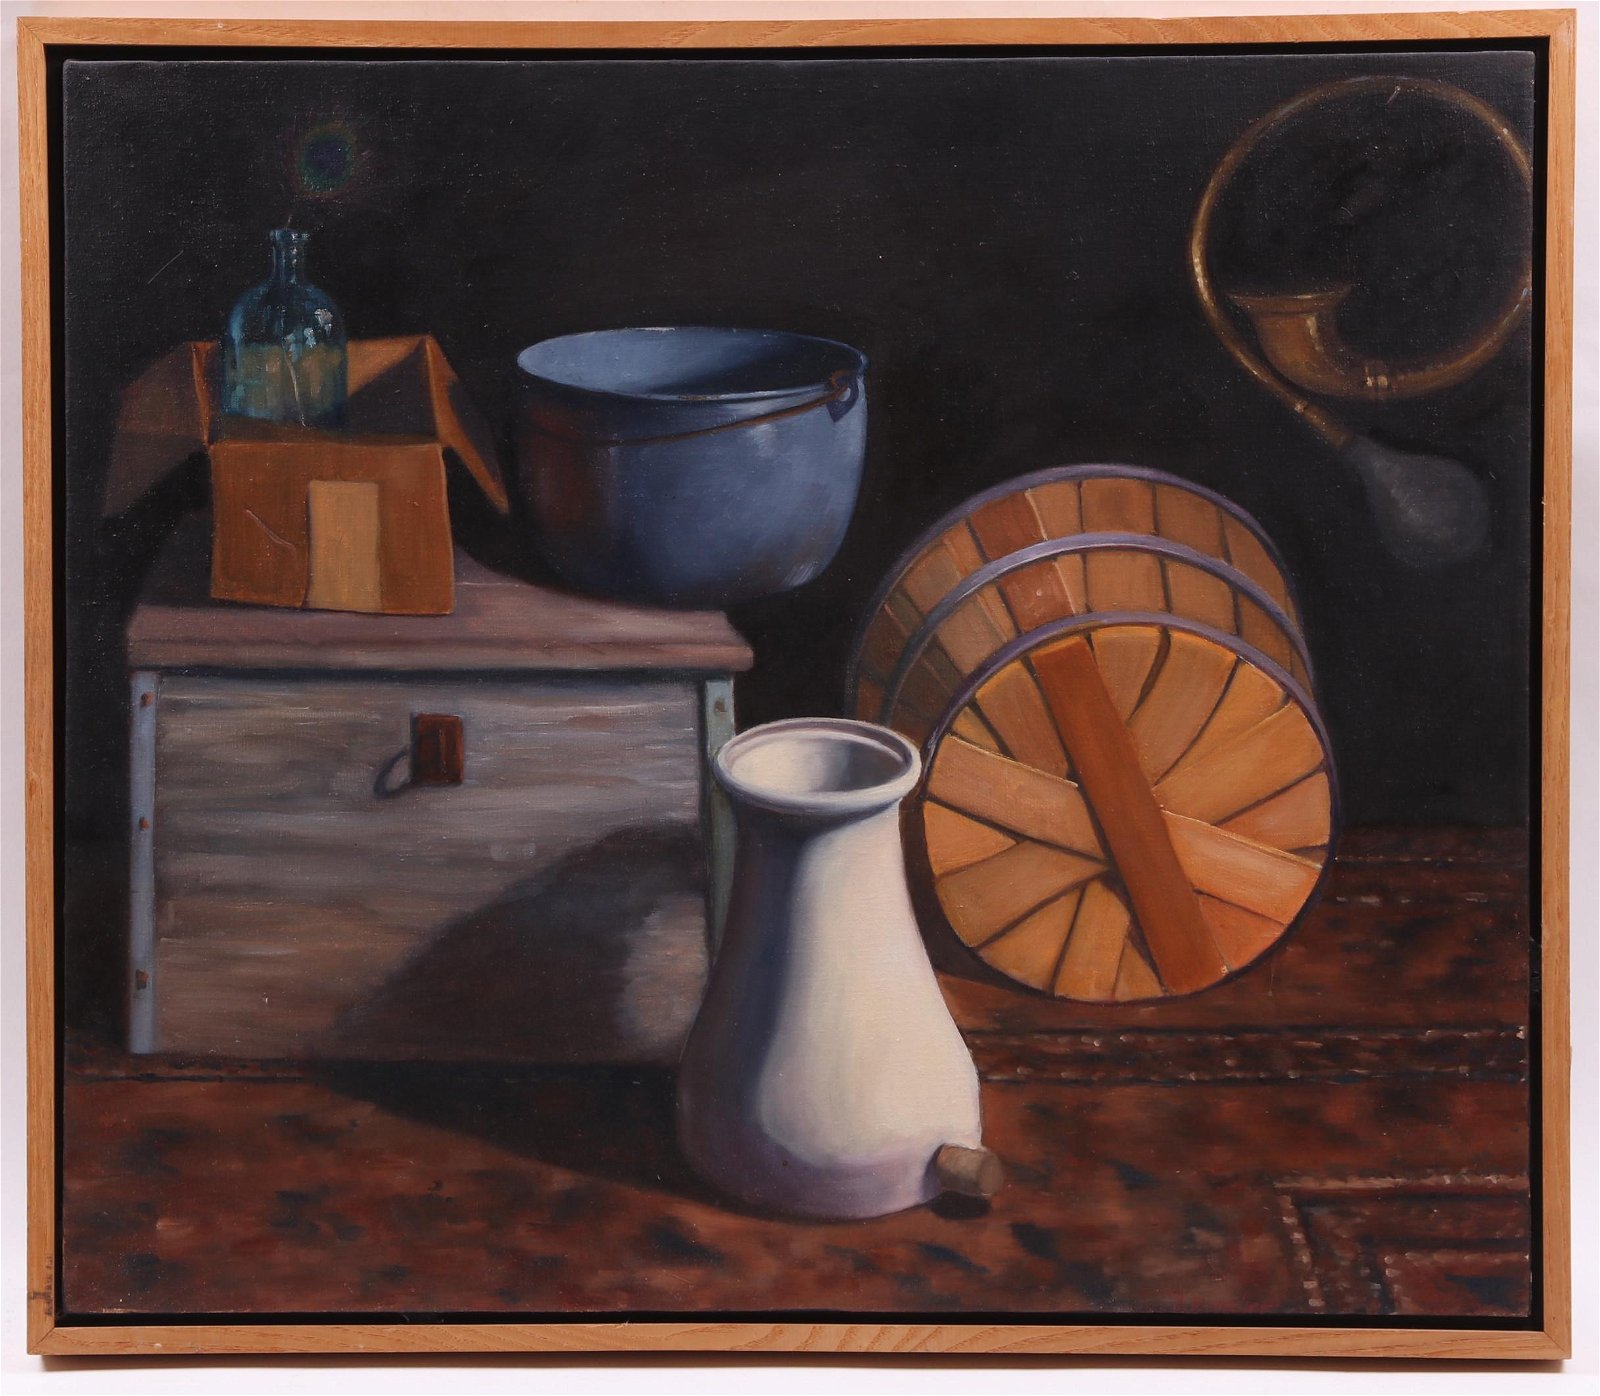 A Modern Still Life, Oil on Canvas